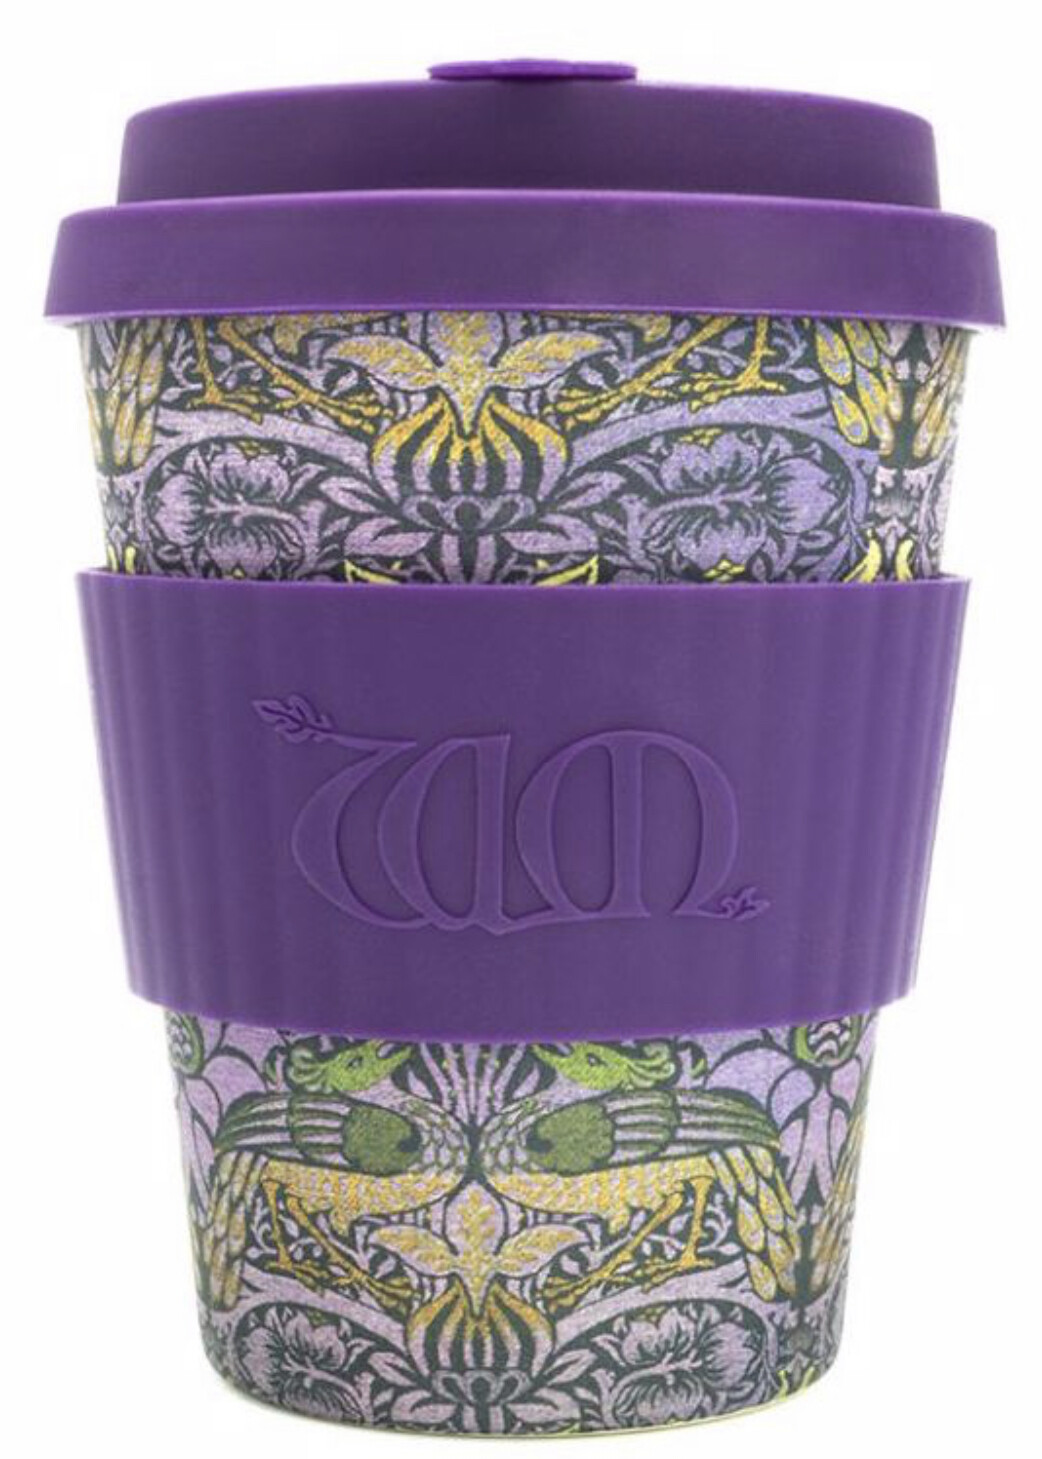 ECOFFEE -Re-usable Bamboo Cup, Ecoffee Keep Cup 12 oz-PEACOCK